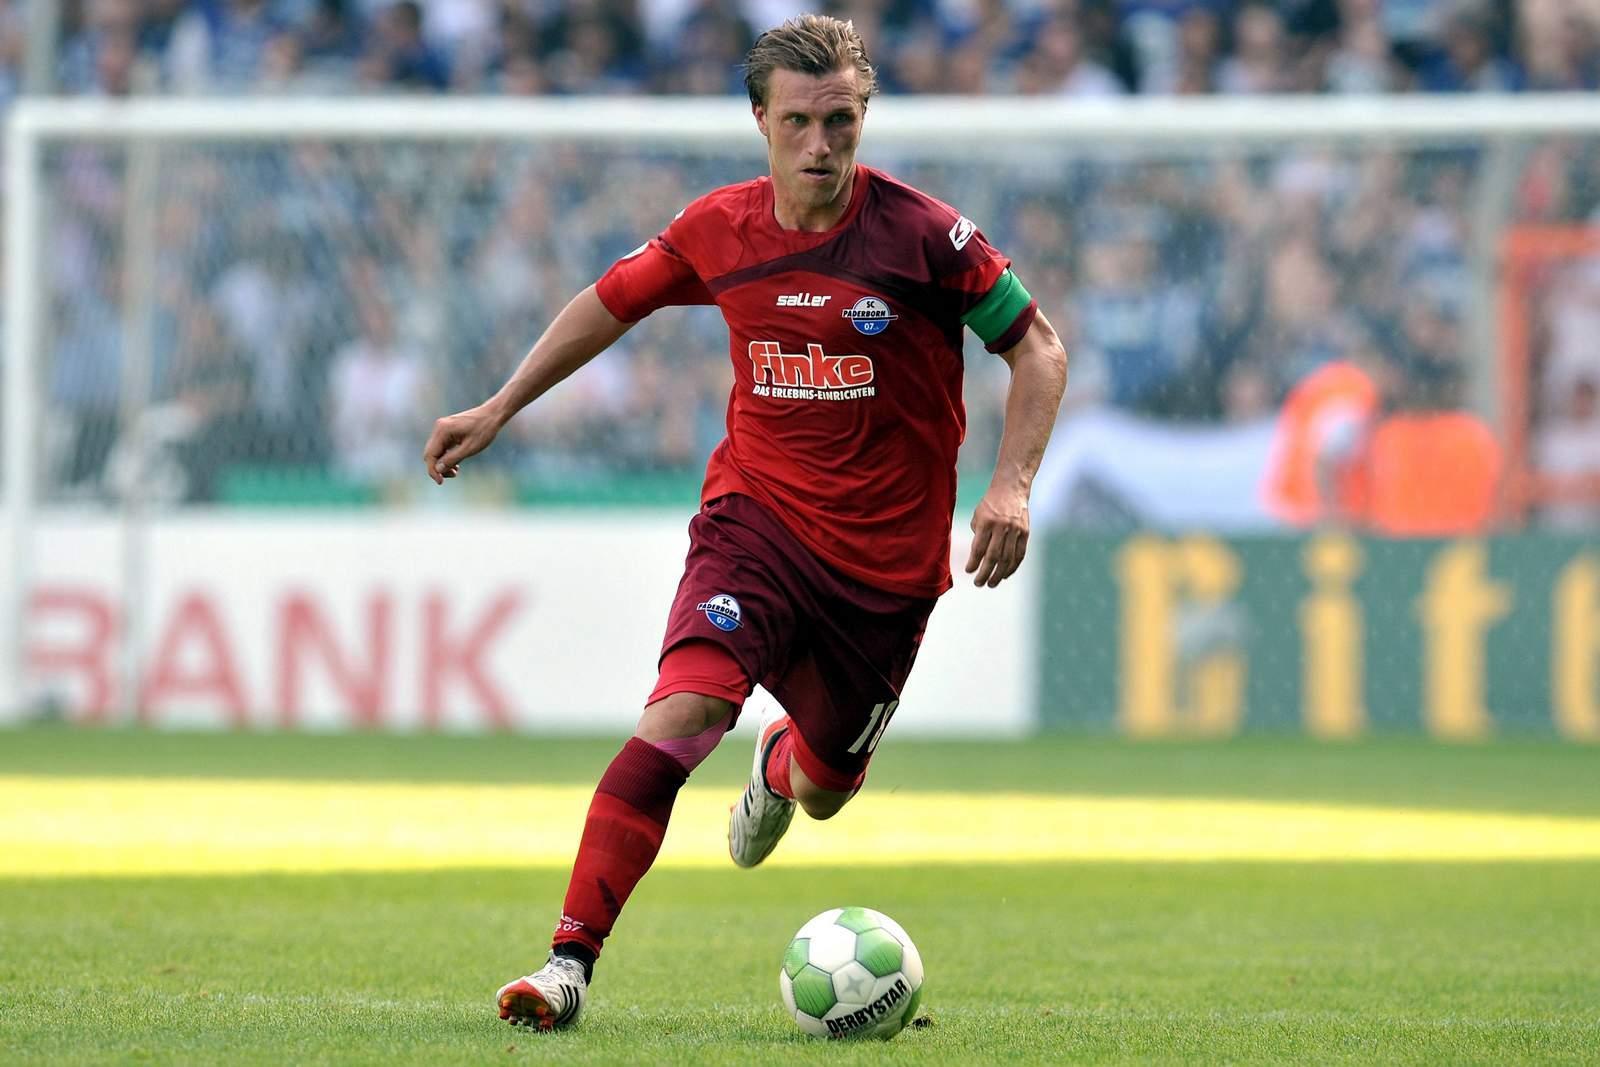 Markus Krösche im Trikot des SC Paderborn 07.